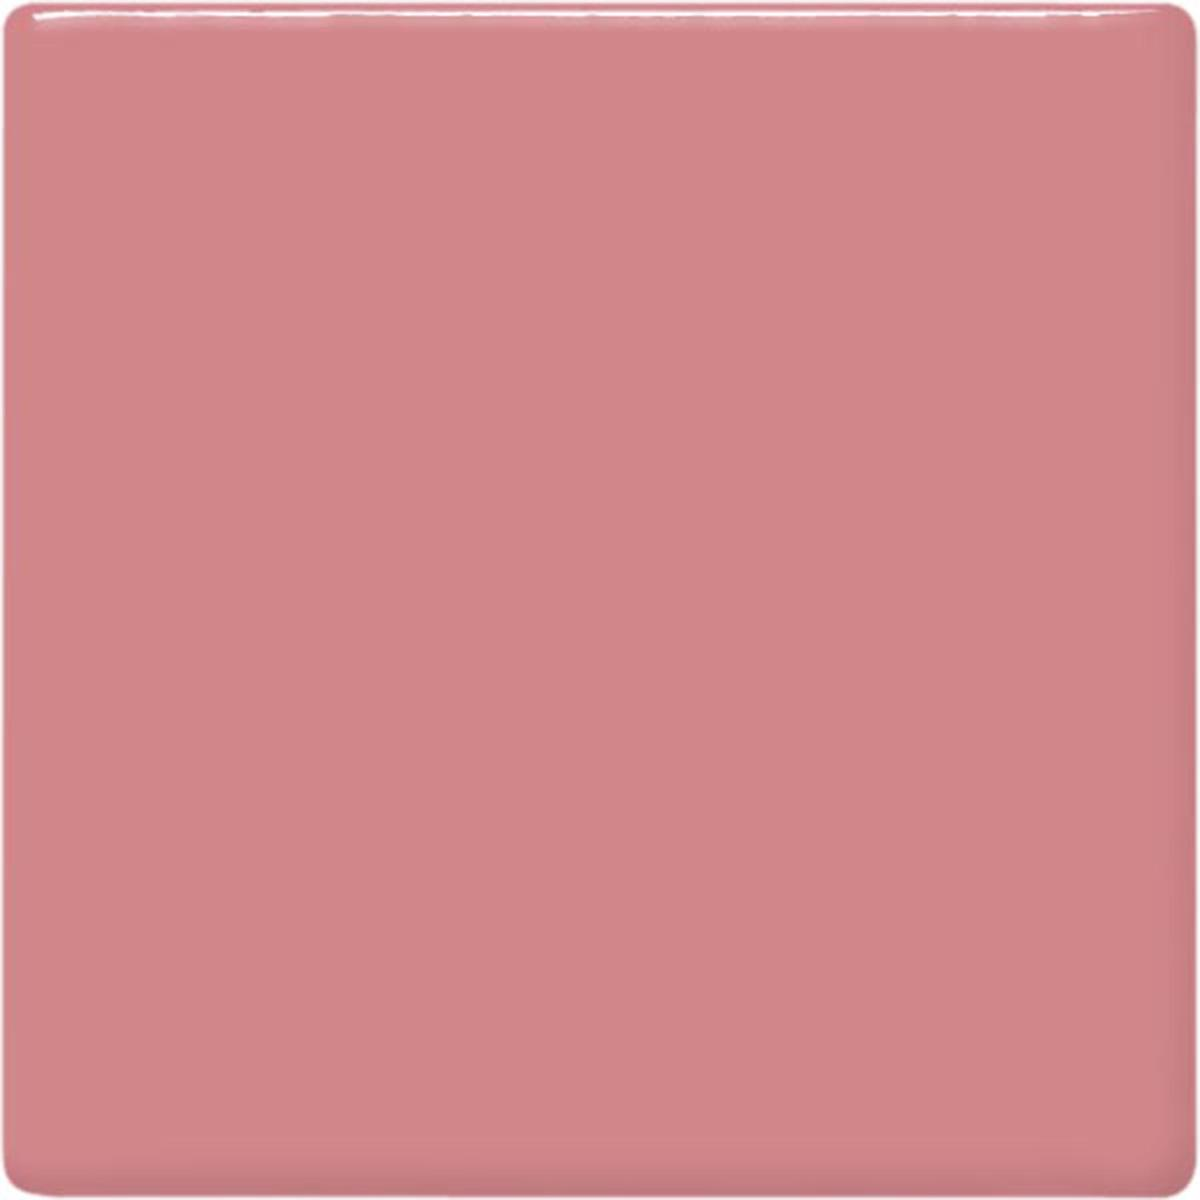 venta de esmalte para cerámica amaco teachers palette Tp-53 pig pink baja temperatura